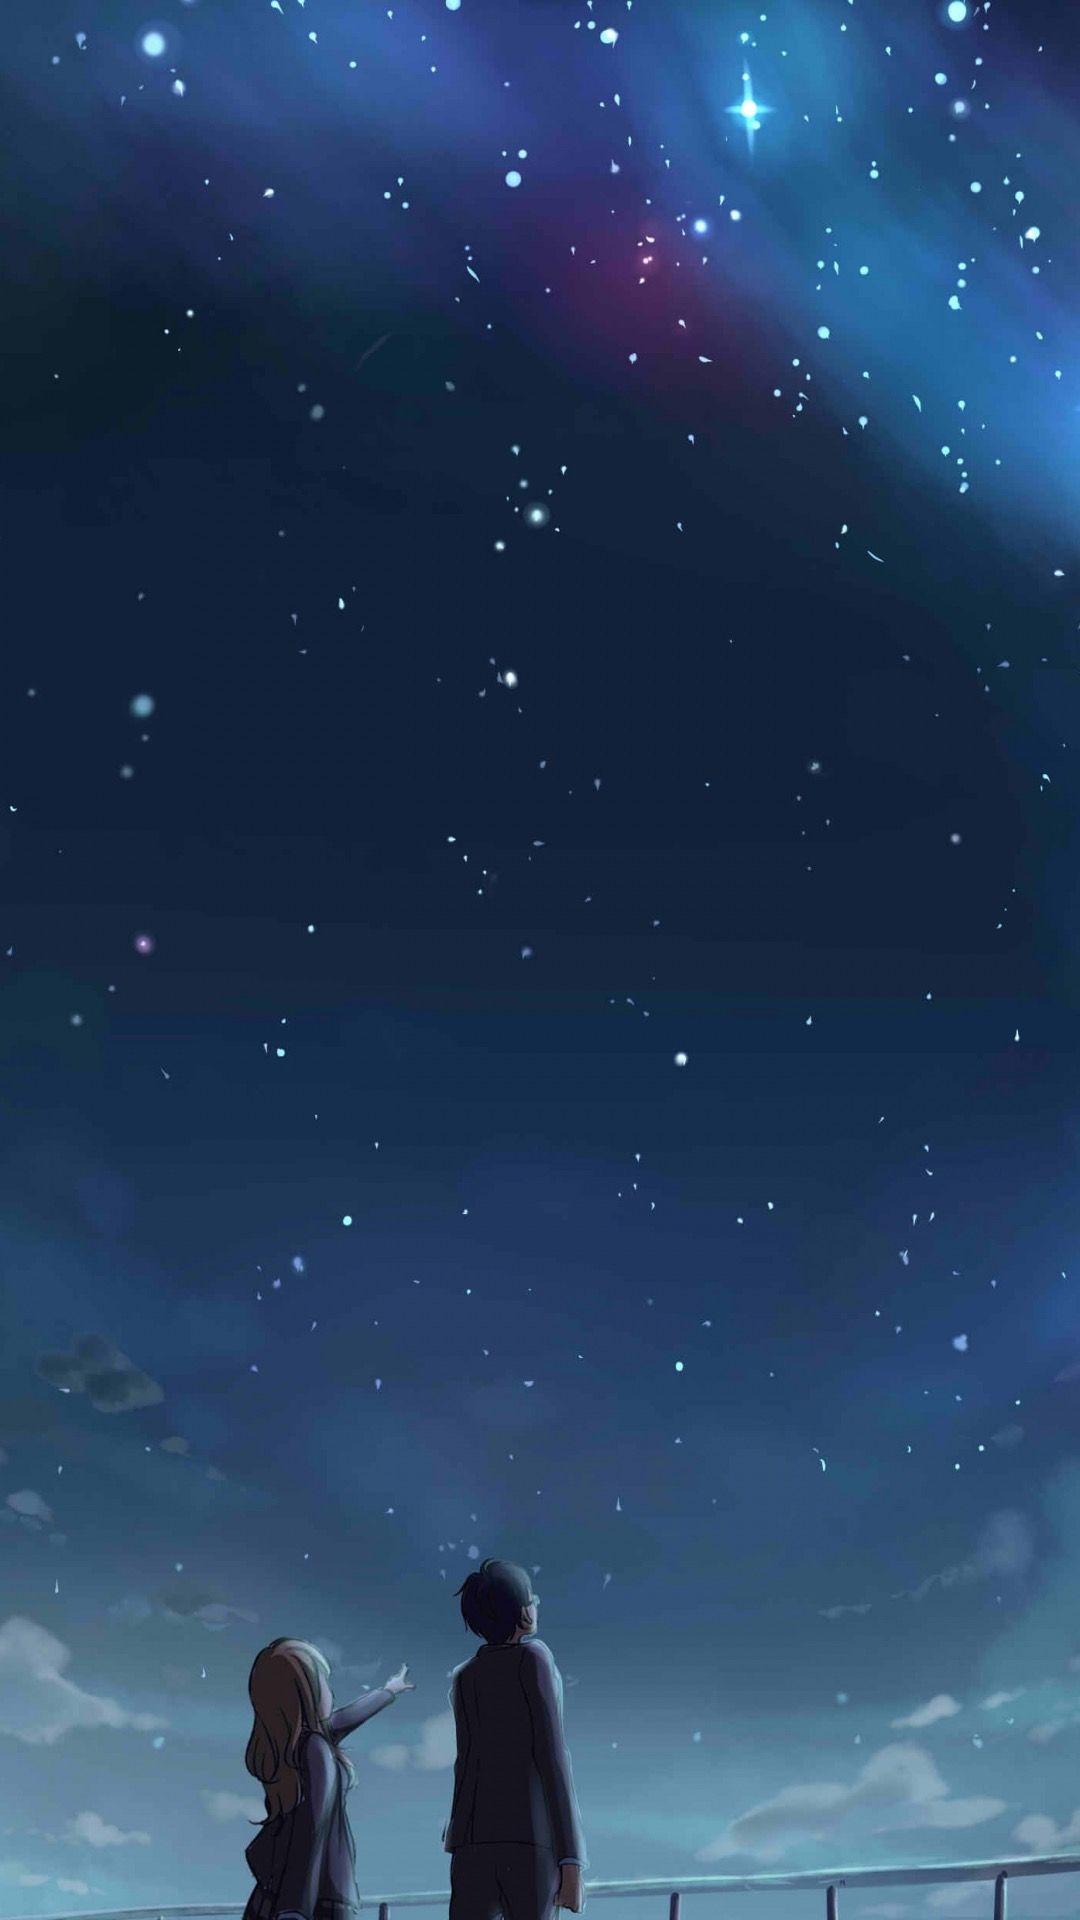 Buenas Noches Corazon Anime Scenery Couple Wallpaper Anime Background